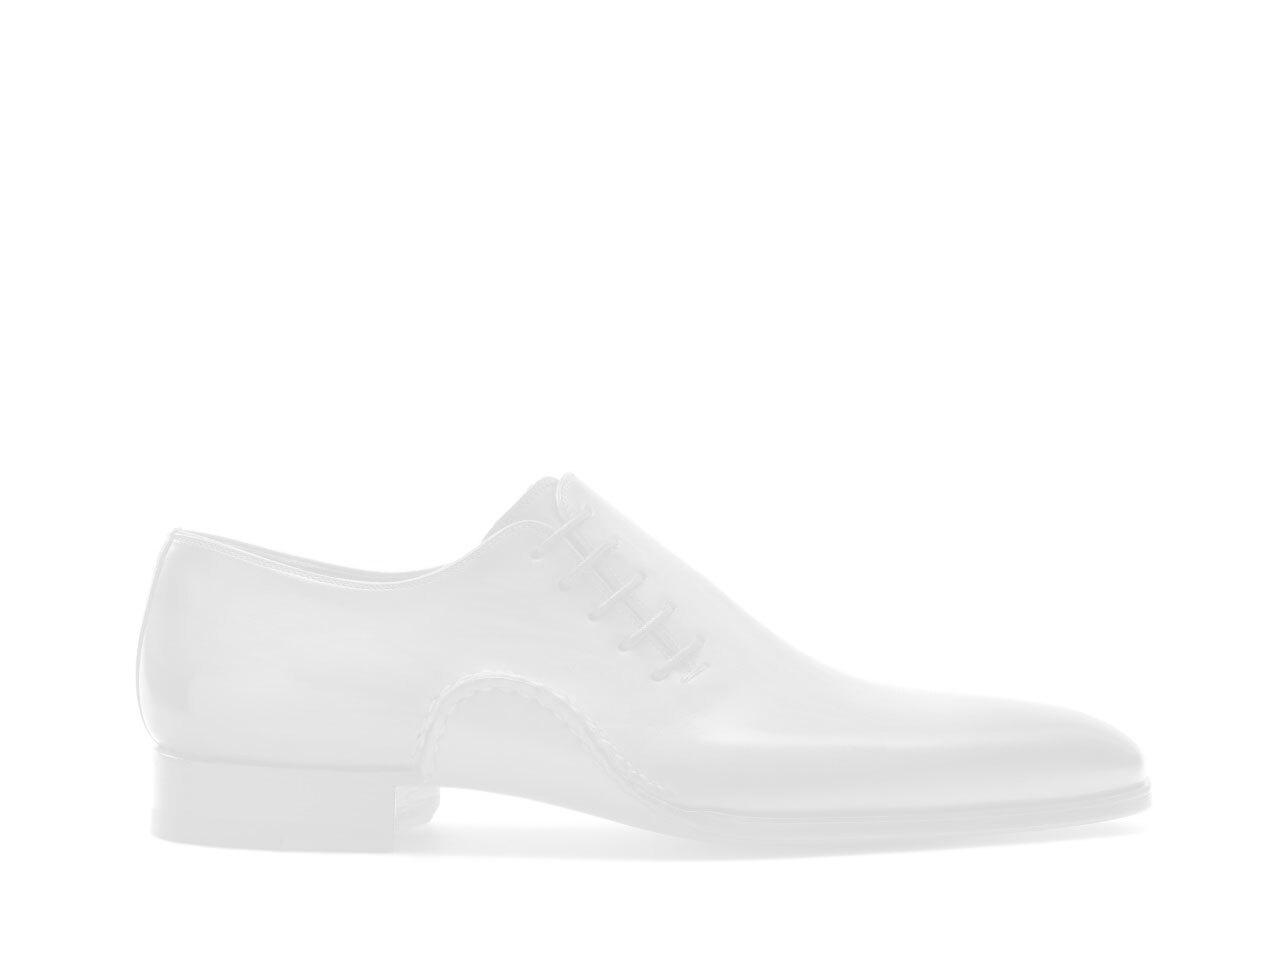 Pair of the Magnanni Turo Lo Grey Men's Sneakers